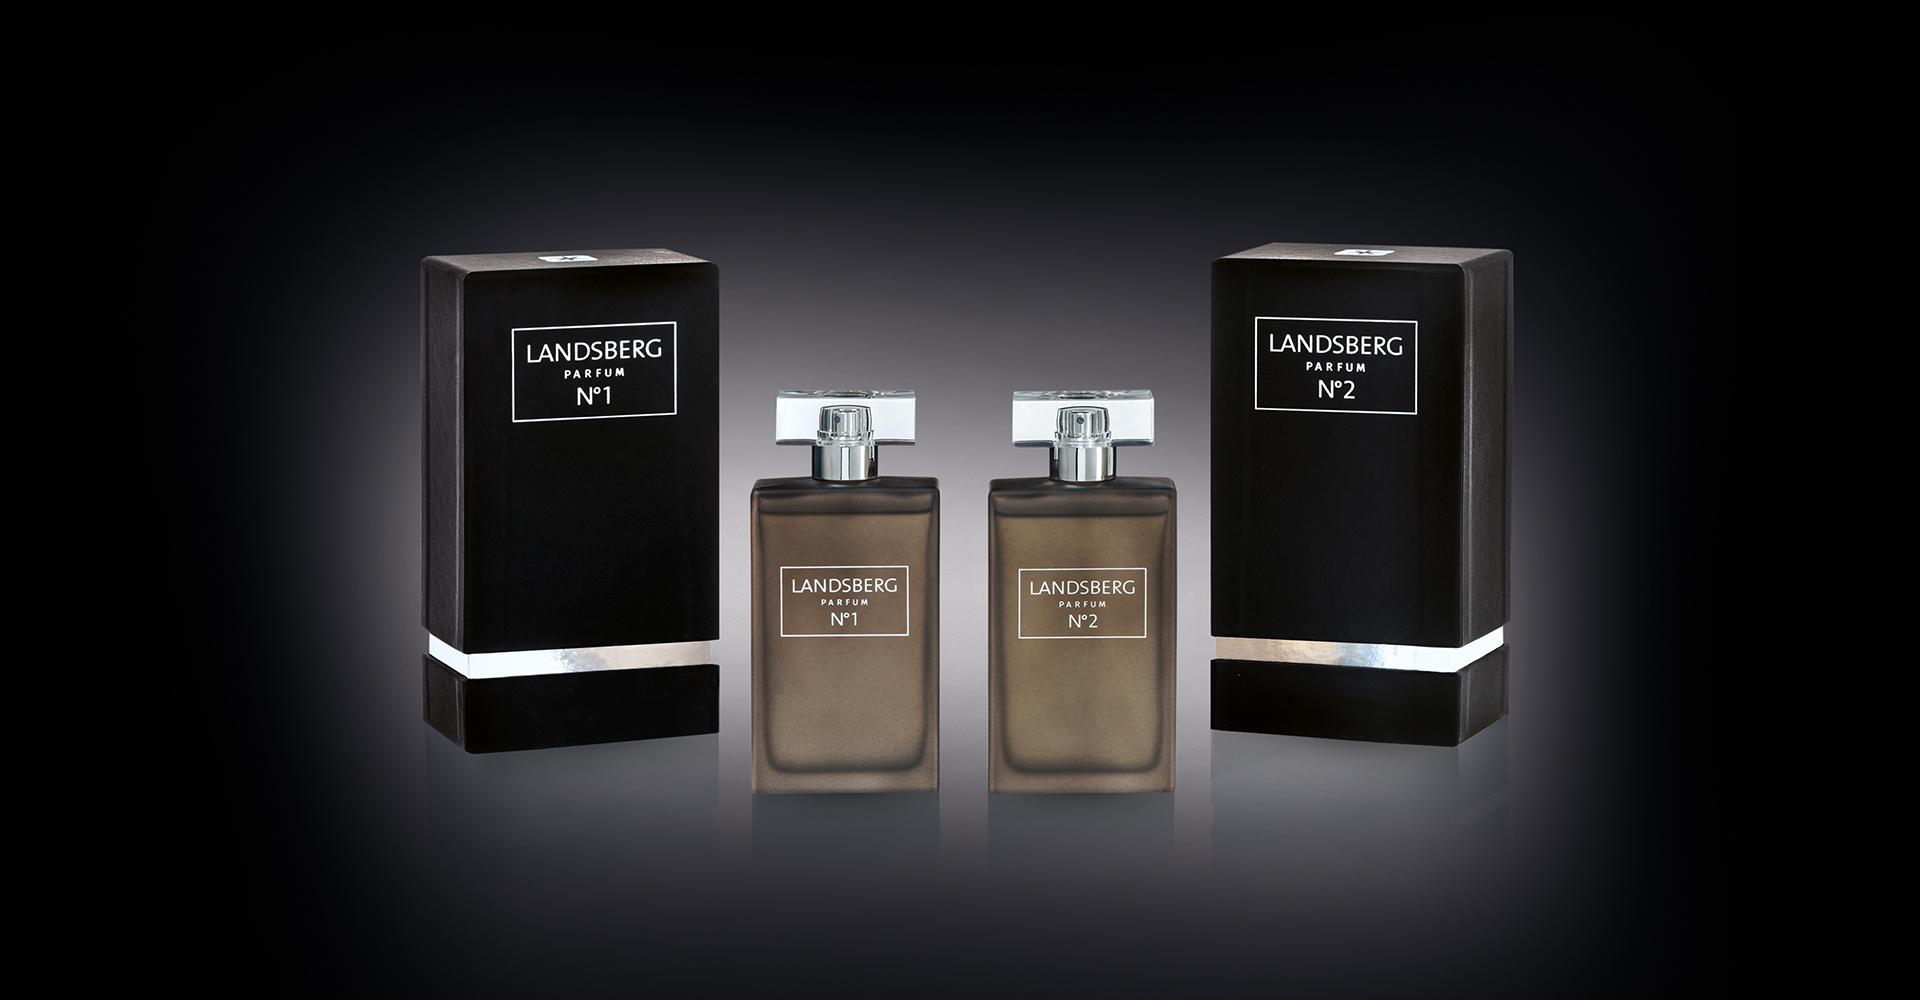 Landsberg Parfum